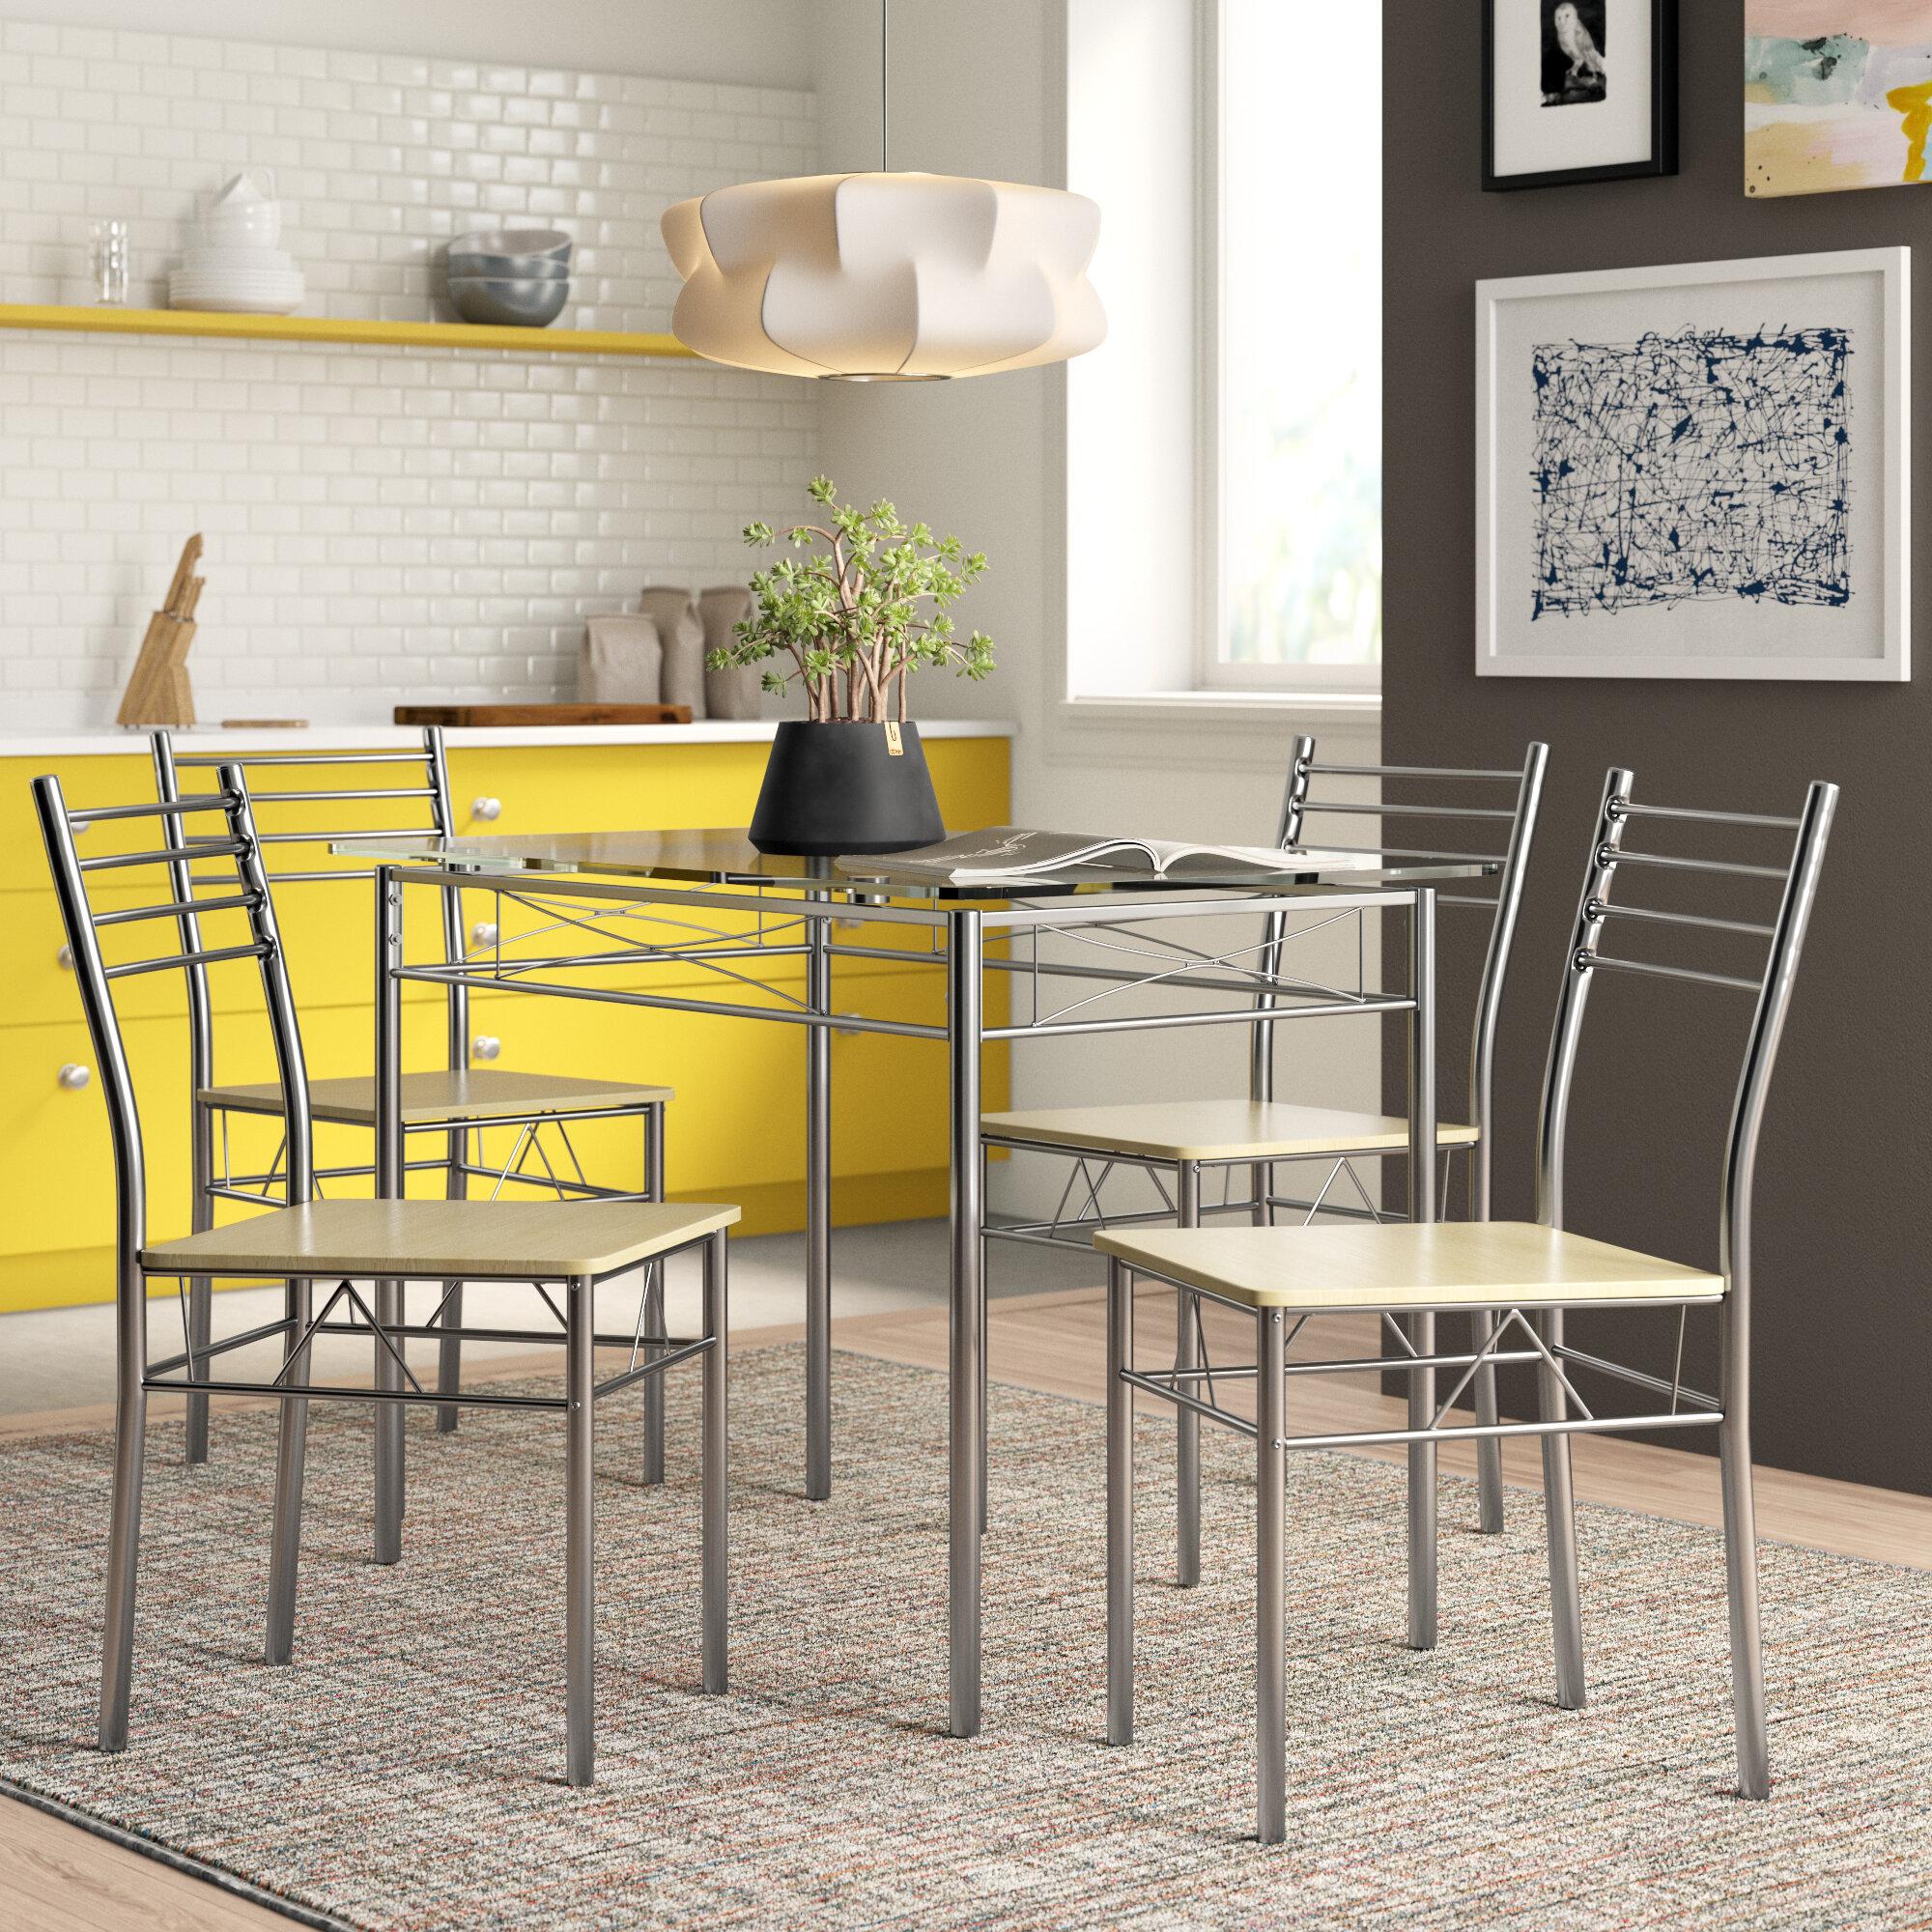 Zipcode Design North Reading 5 Piece Dining Table Set Reviews Wayfair